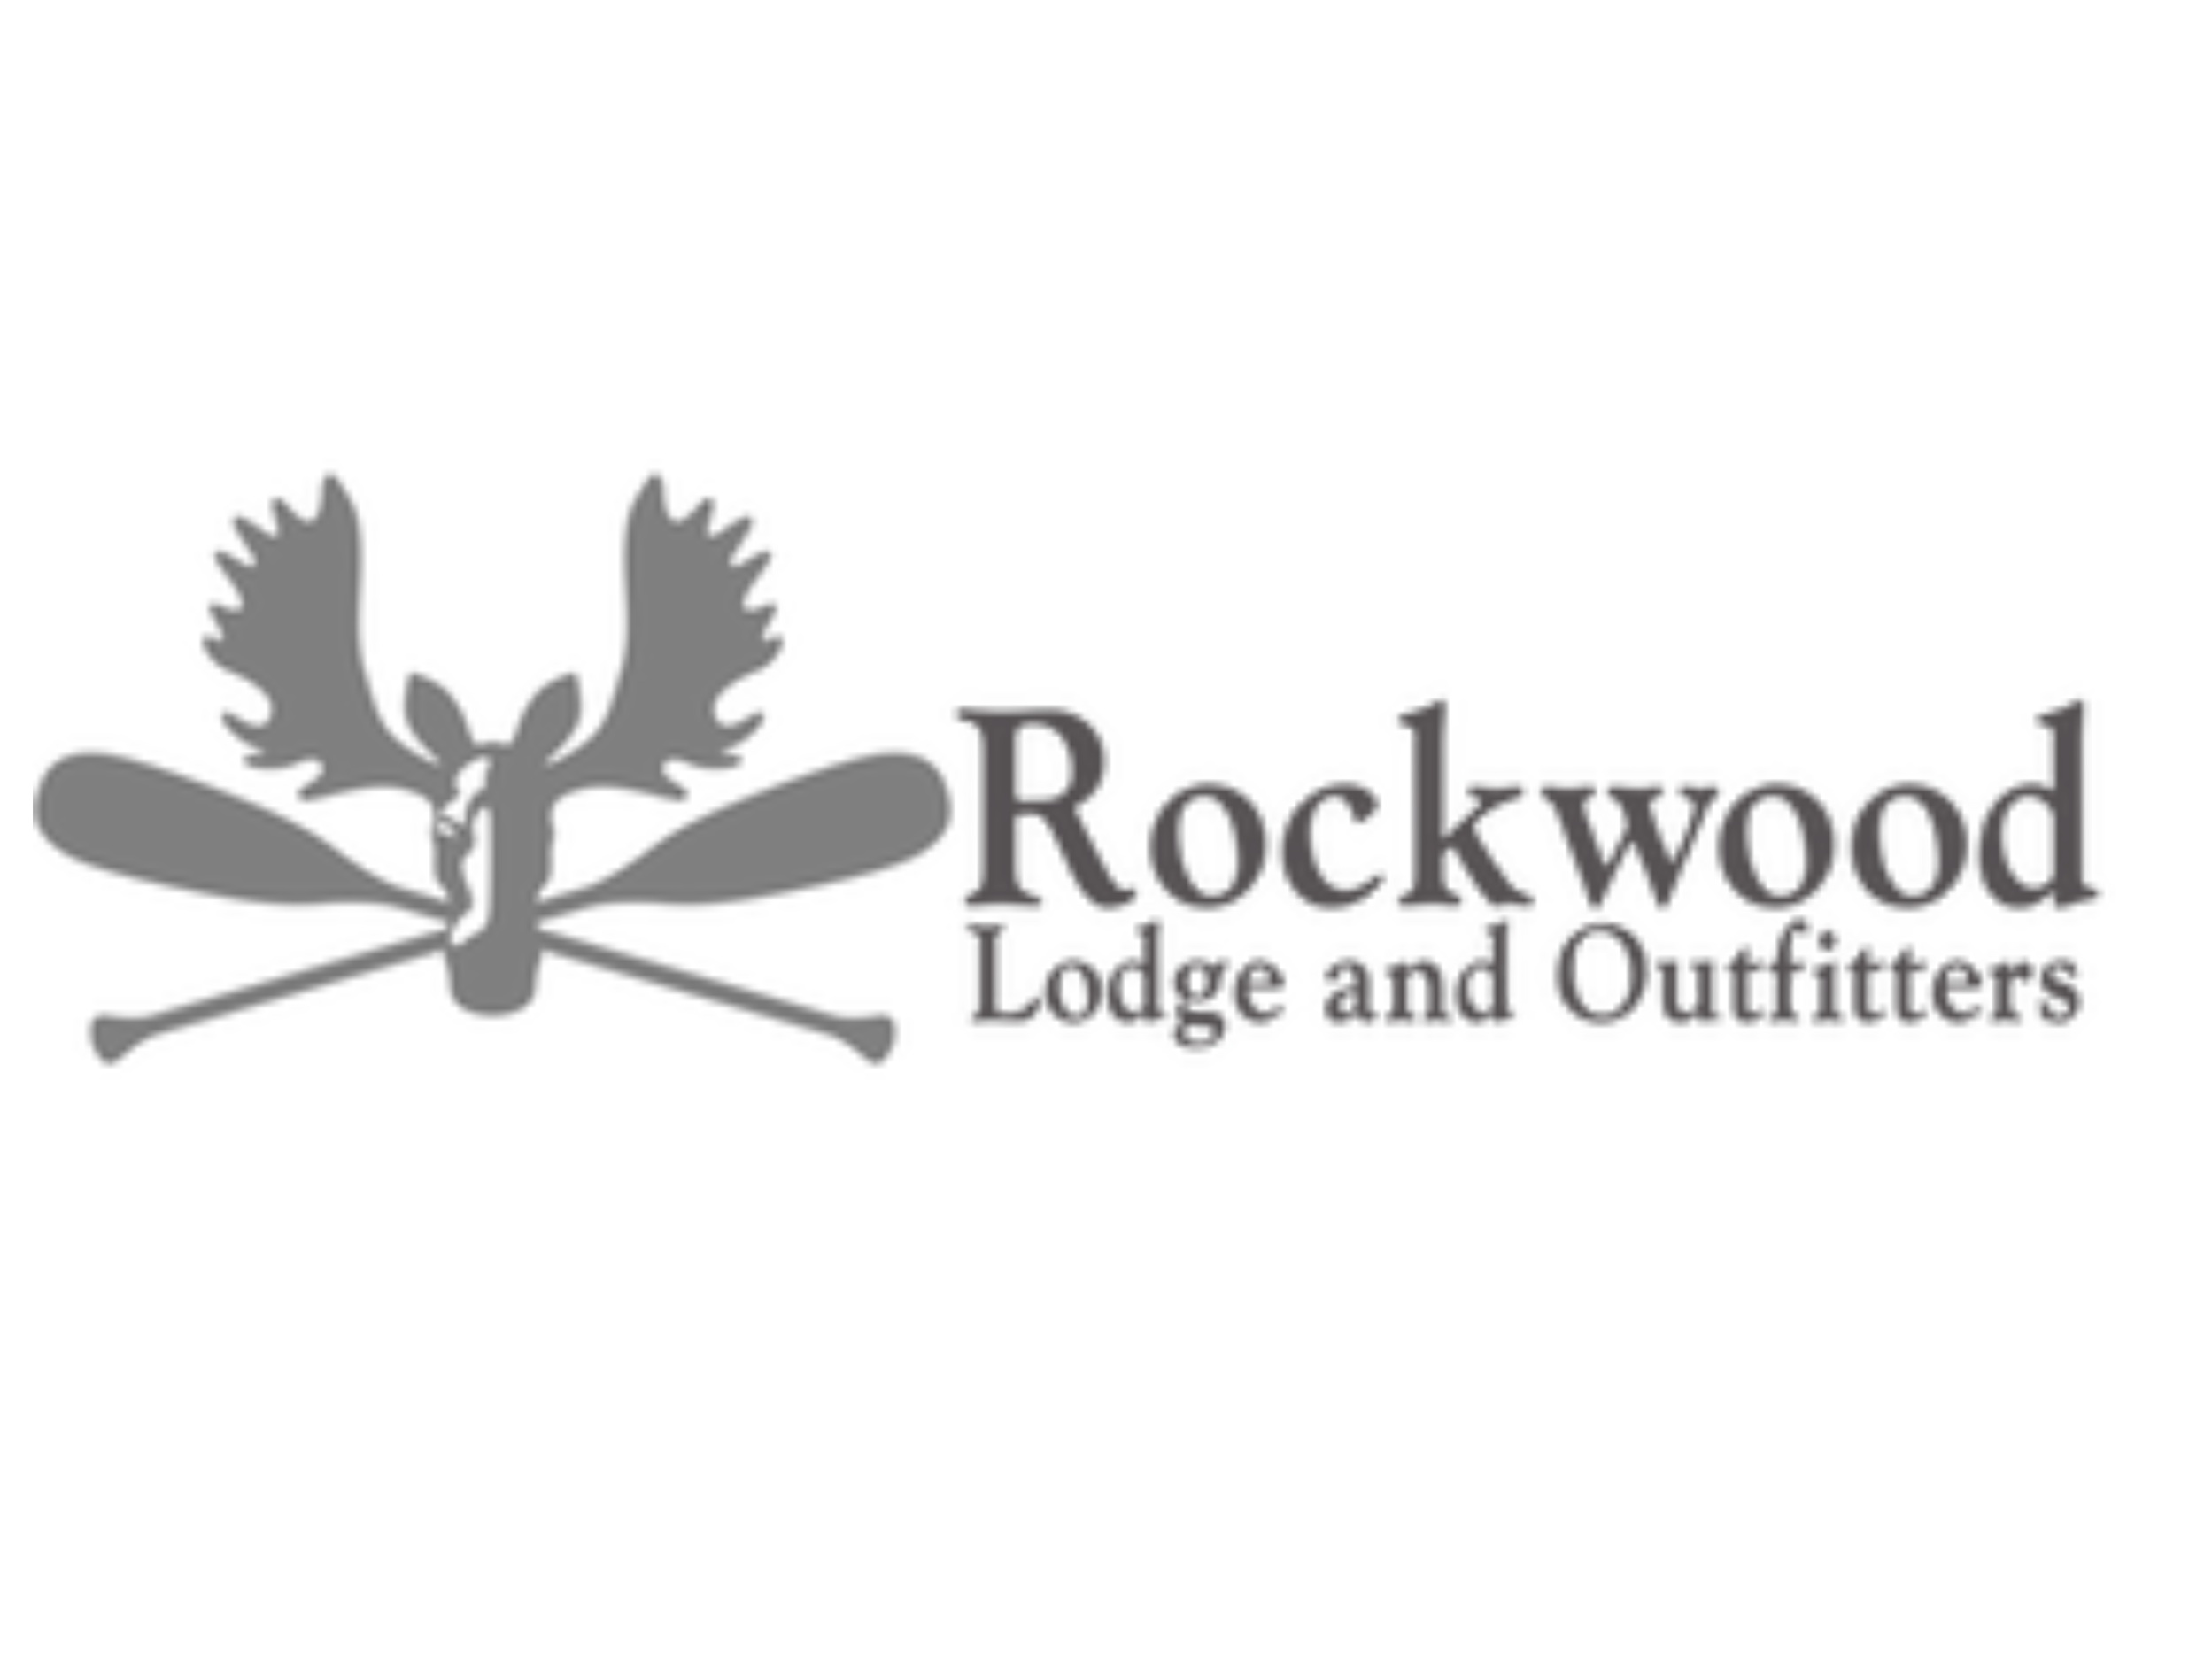 Rockwood lodge - 50 Rockwood Rd.Grand Marais, MN 55604Phone: 218-388-2242Email: info@rockwoodbwca.com